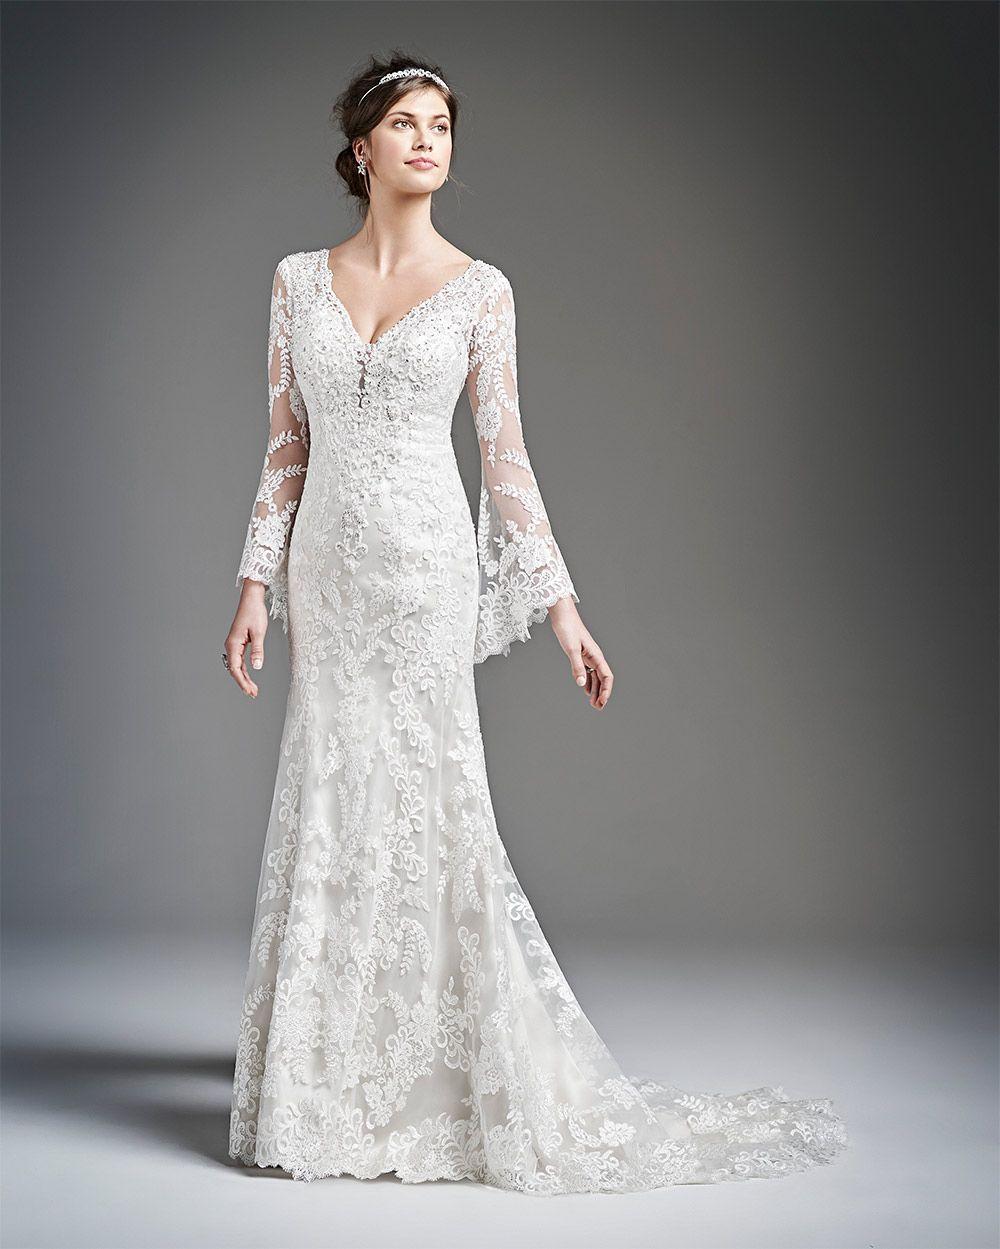 Wedding Dress for Mature Brides - Wedding Dresses for the Mature ...